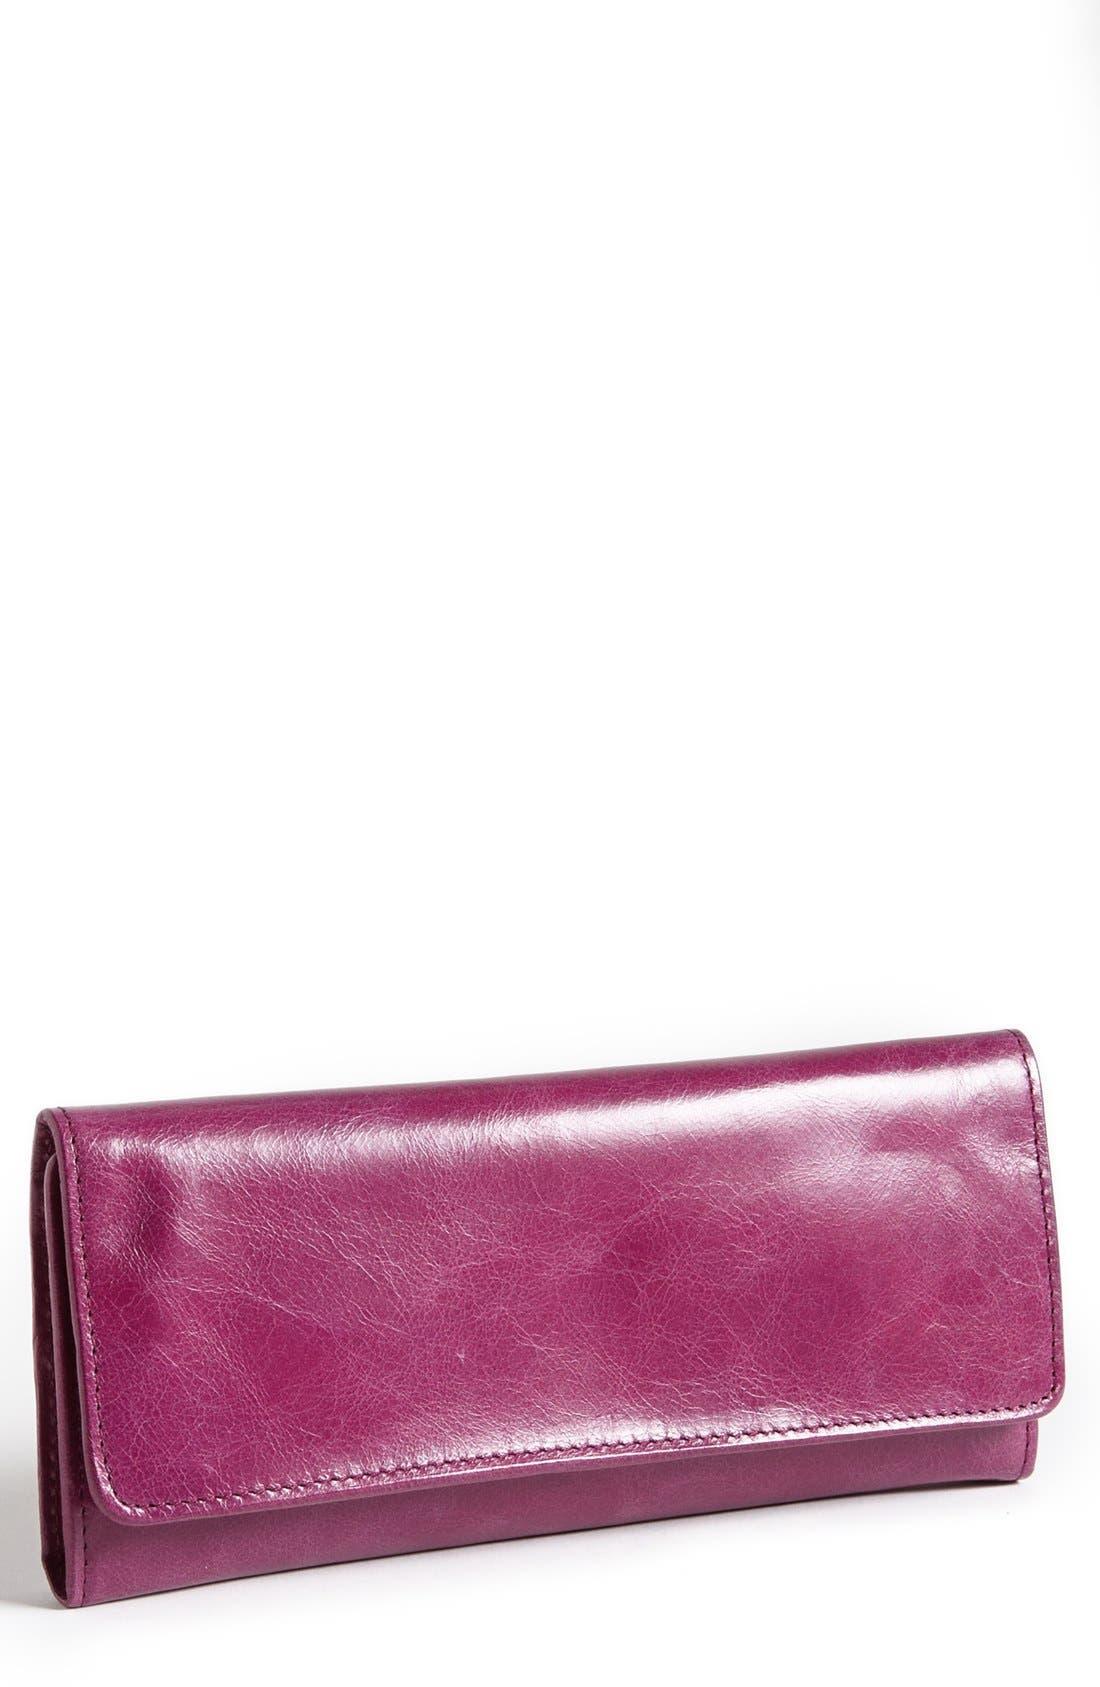 'Sadie' Leather Wallet,                             Main thumbnail 47, color,